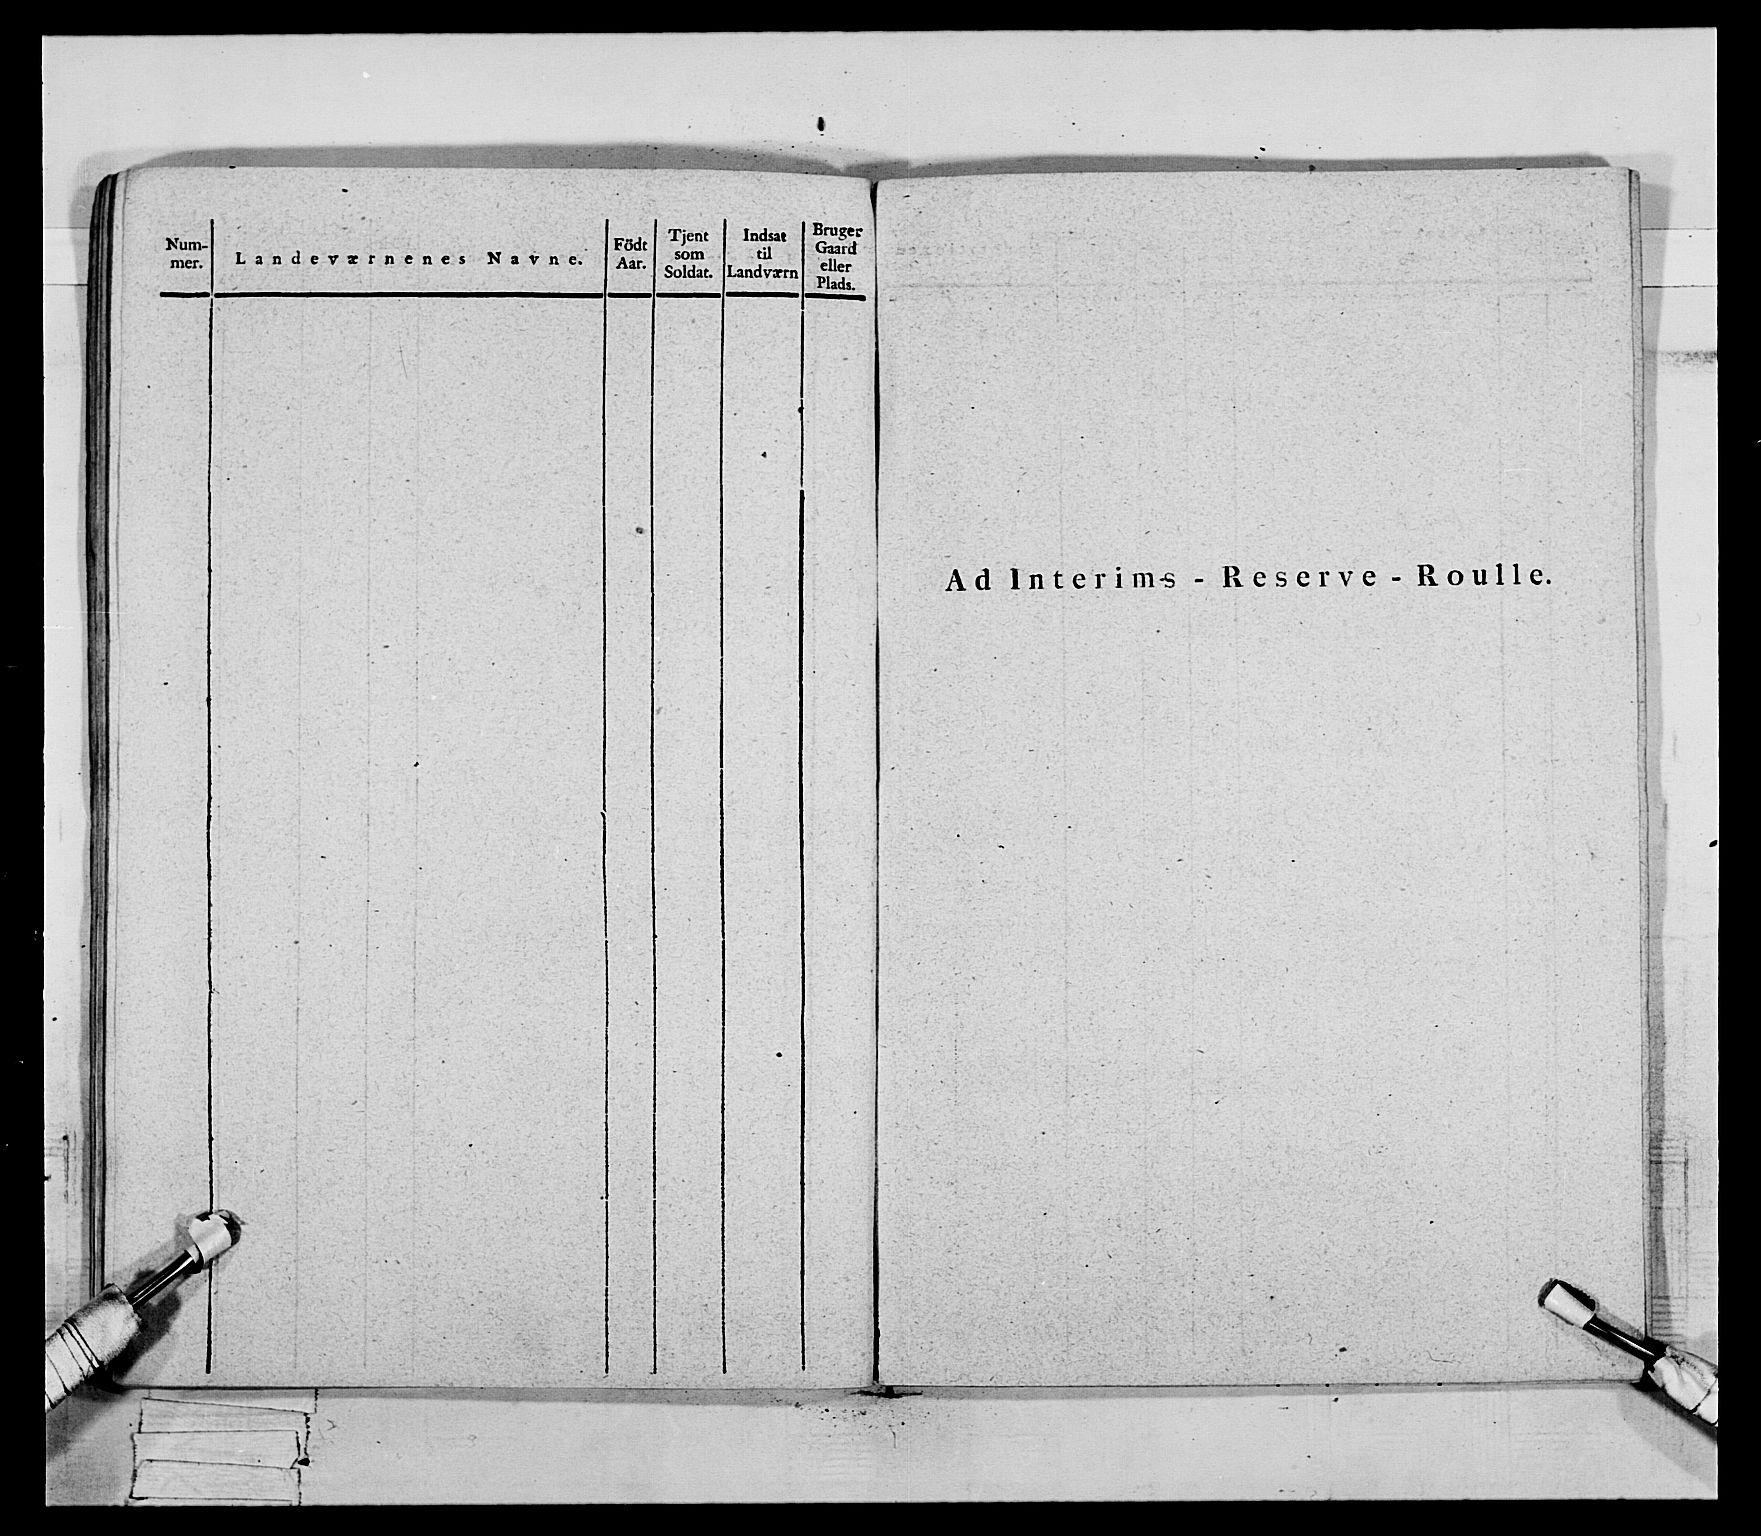 RA, Generalitets- og kommissariatskollegiet, Det kongelige norske kommissariatskollegium, E/Eh/L0069: Opplandske gevorbne infanteriregiment, 1810-1818, s. 697